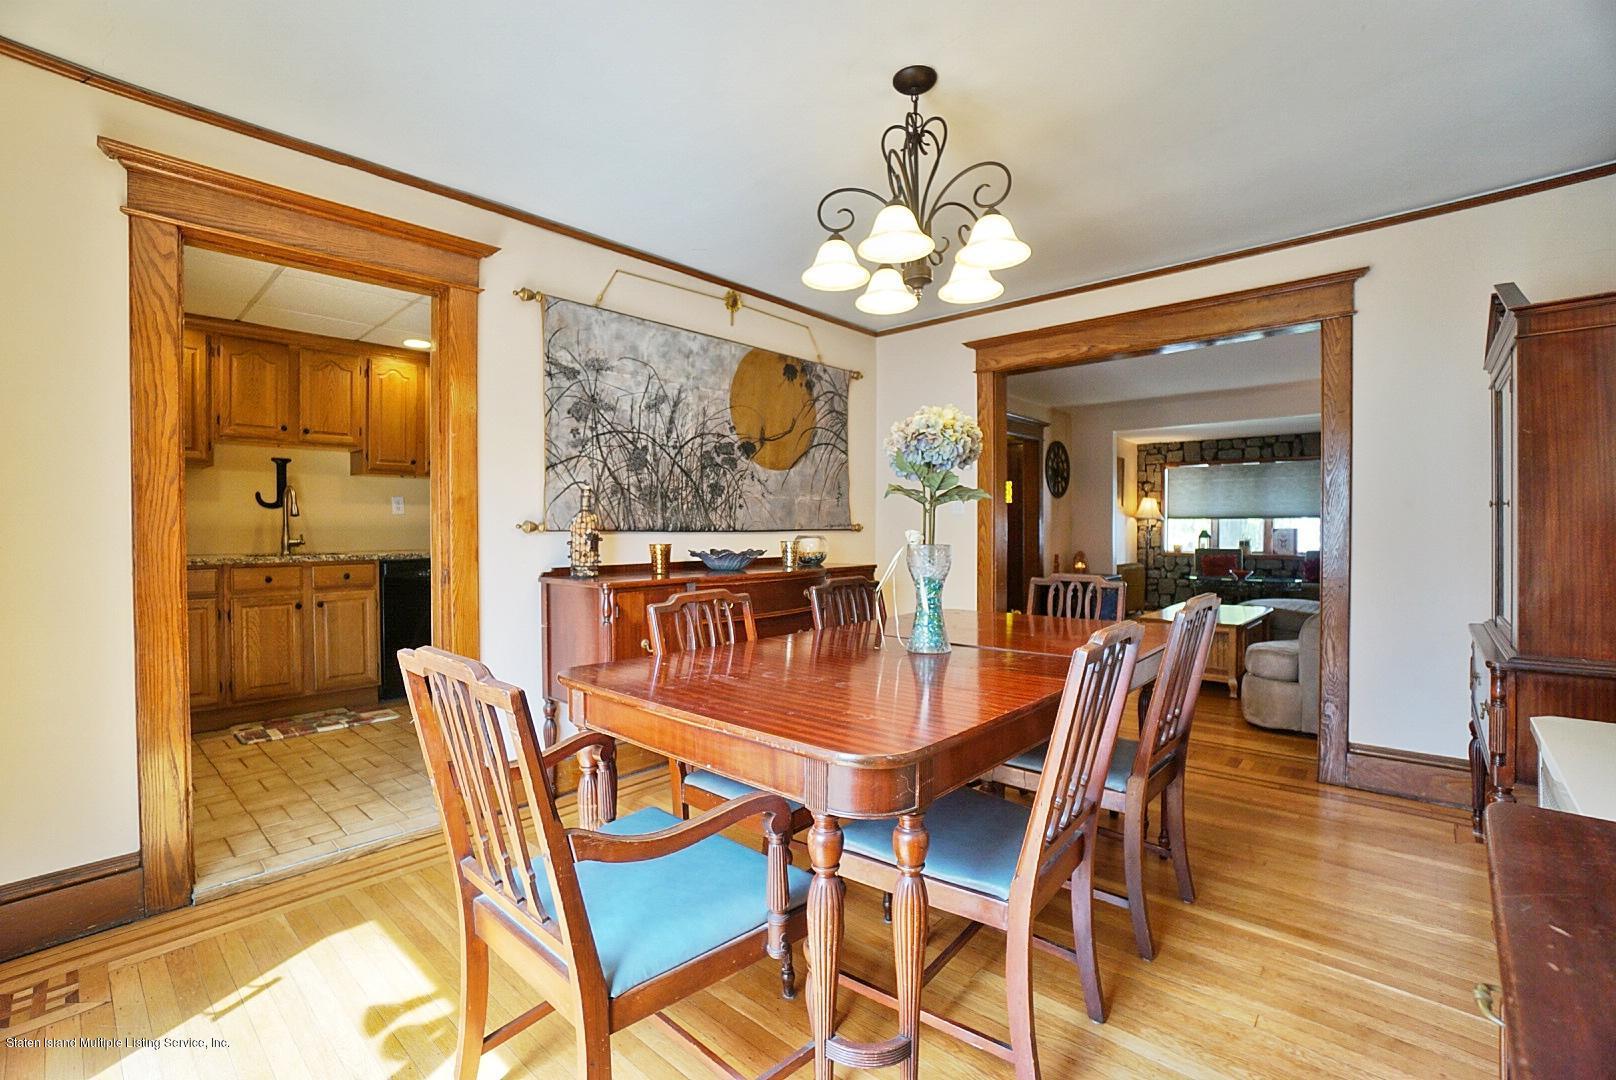 Single Family - Detached 22 Maine Avenue  Staten Island, NY 10314, MLS-1128323-22